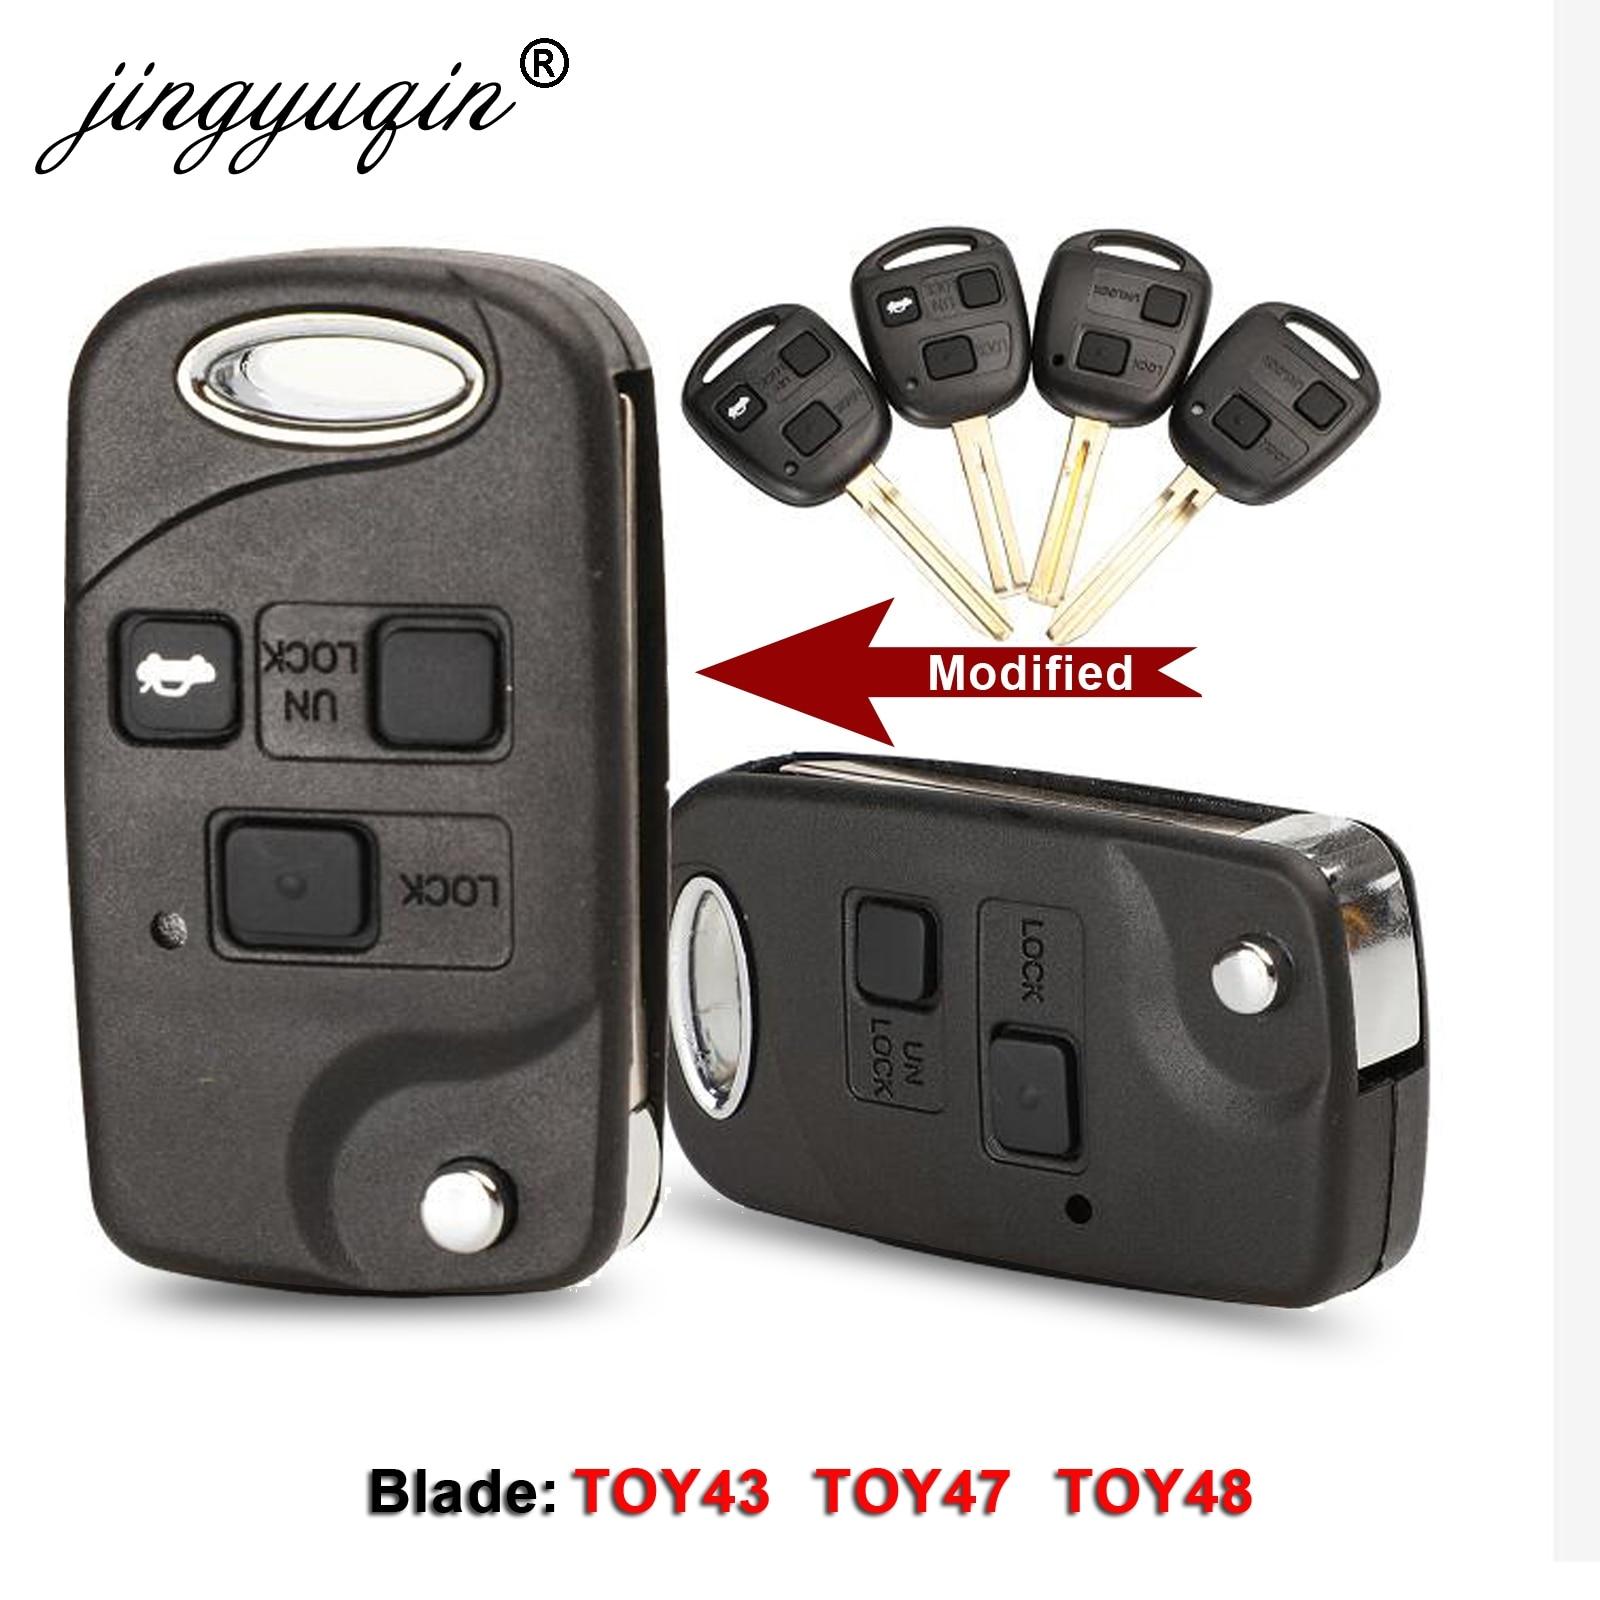 Remote Car Key Shell Case 2/3 BTN For Toyota Yaris Prado Tarago Camry Corolla TOY43 / TOY47 / TOY48 Blade +Rubber Button Pad